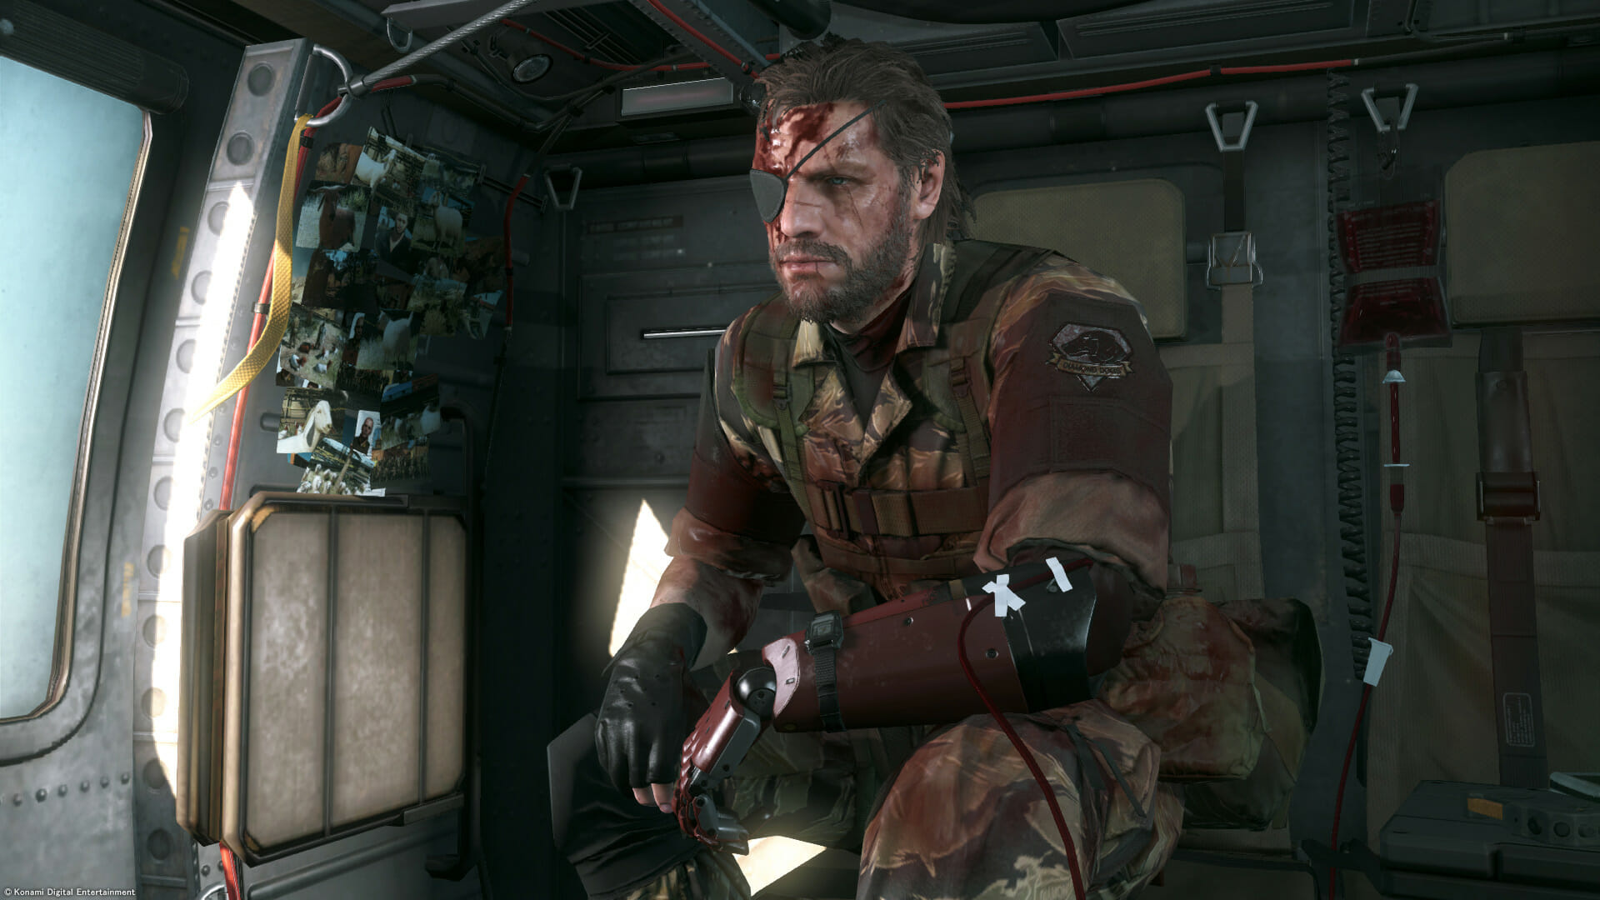 Metal Gear Solid V: The Phantom Pain Preview: Secretive Brilliance 4